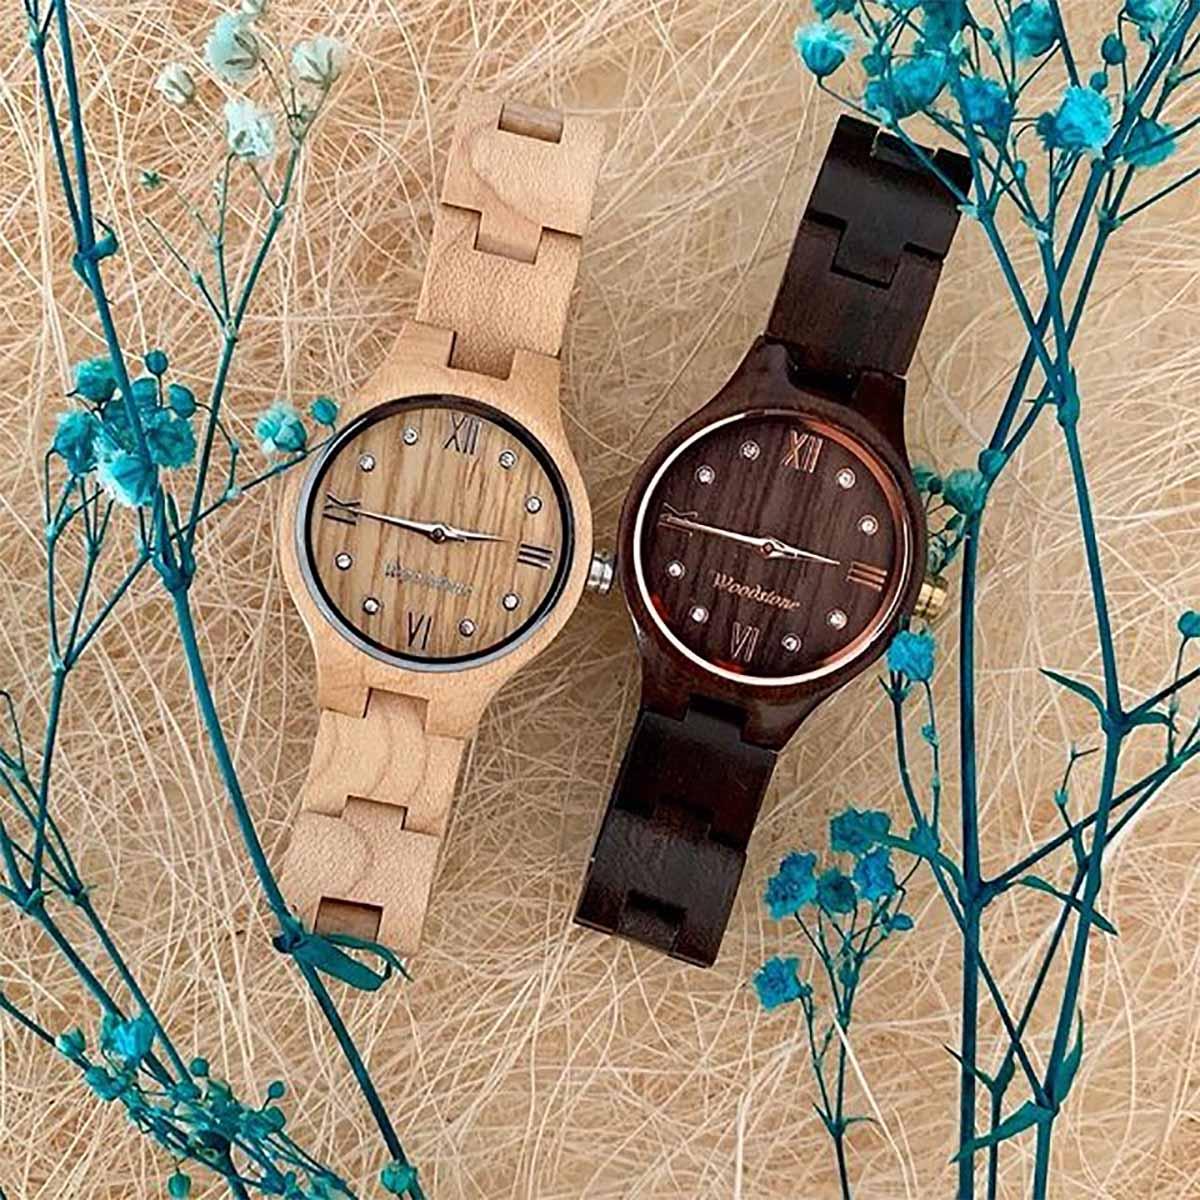 Woodstone-Watches-1